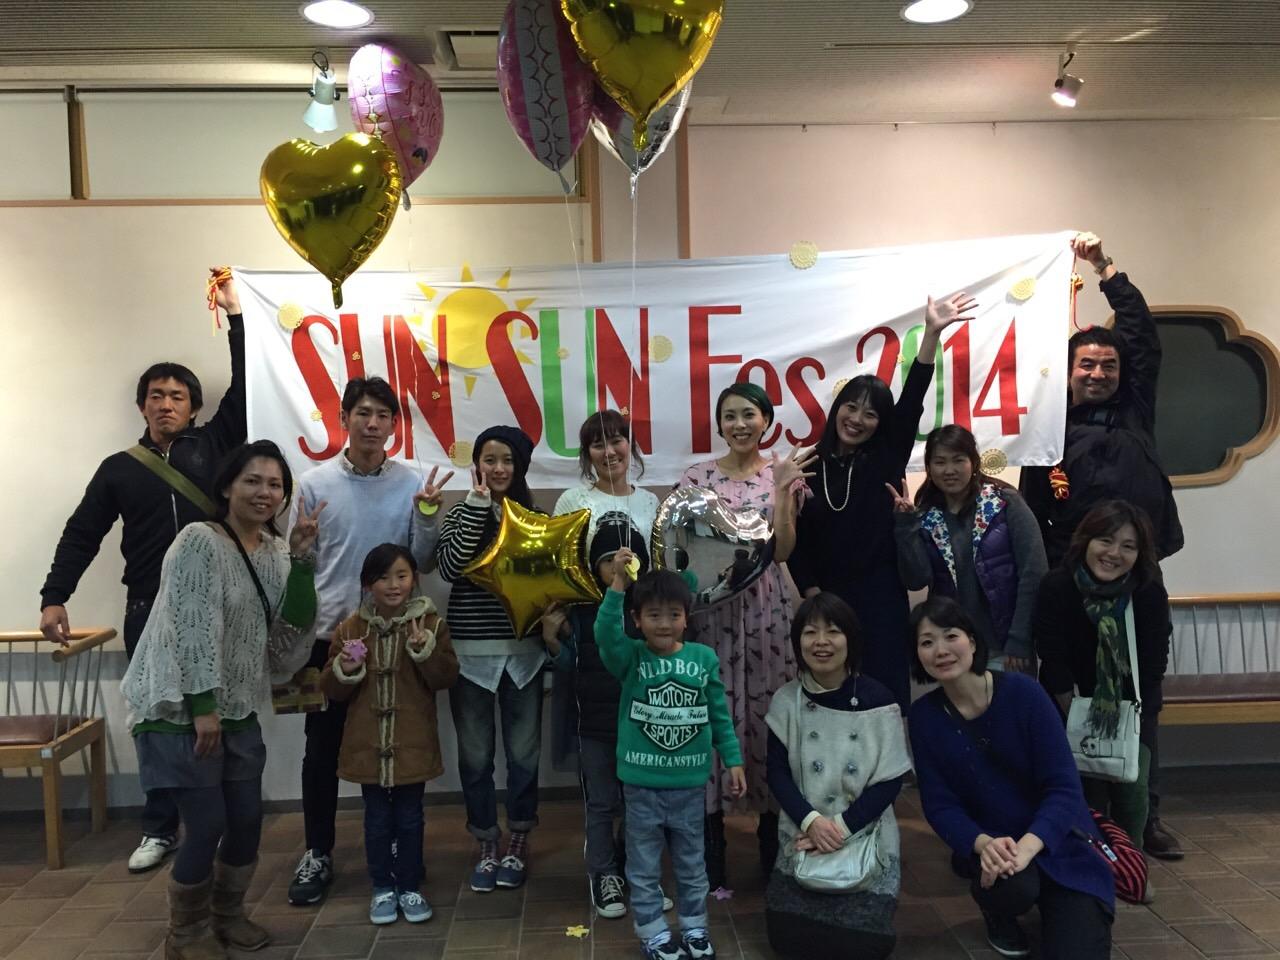 SUNSUNフェス2015@京都梅小路公園 開催決定しました!_f0298223_21225448.jpg